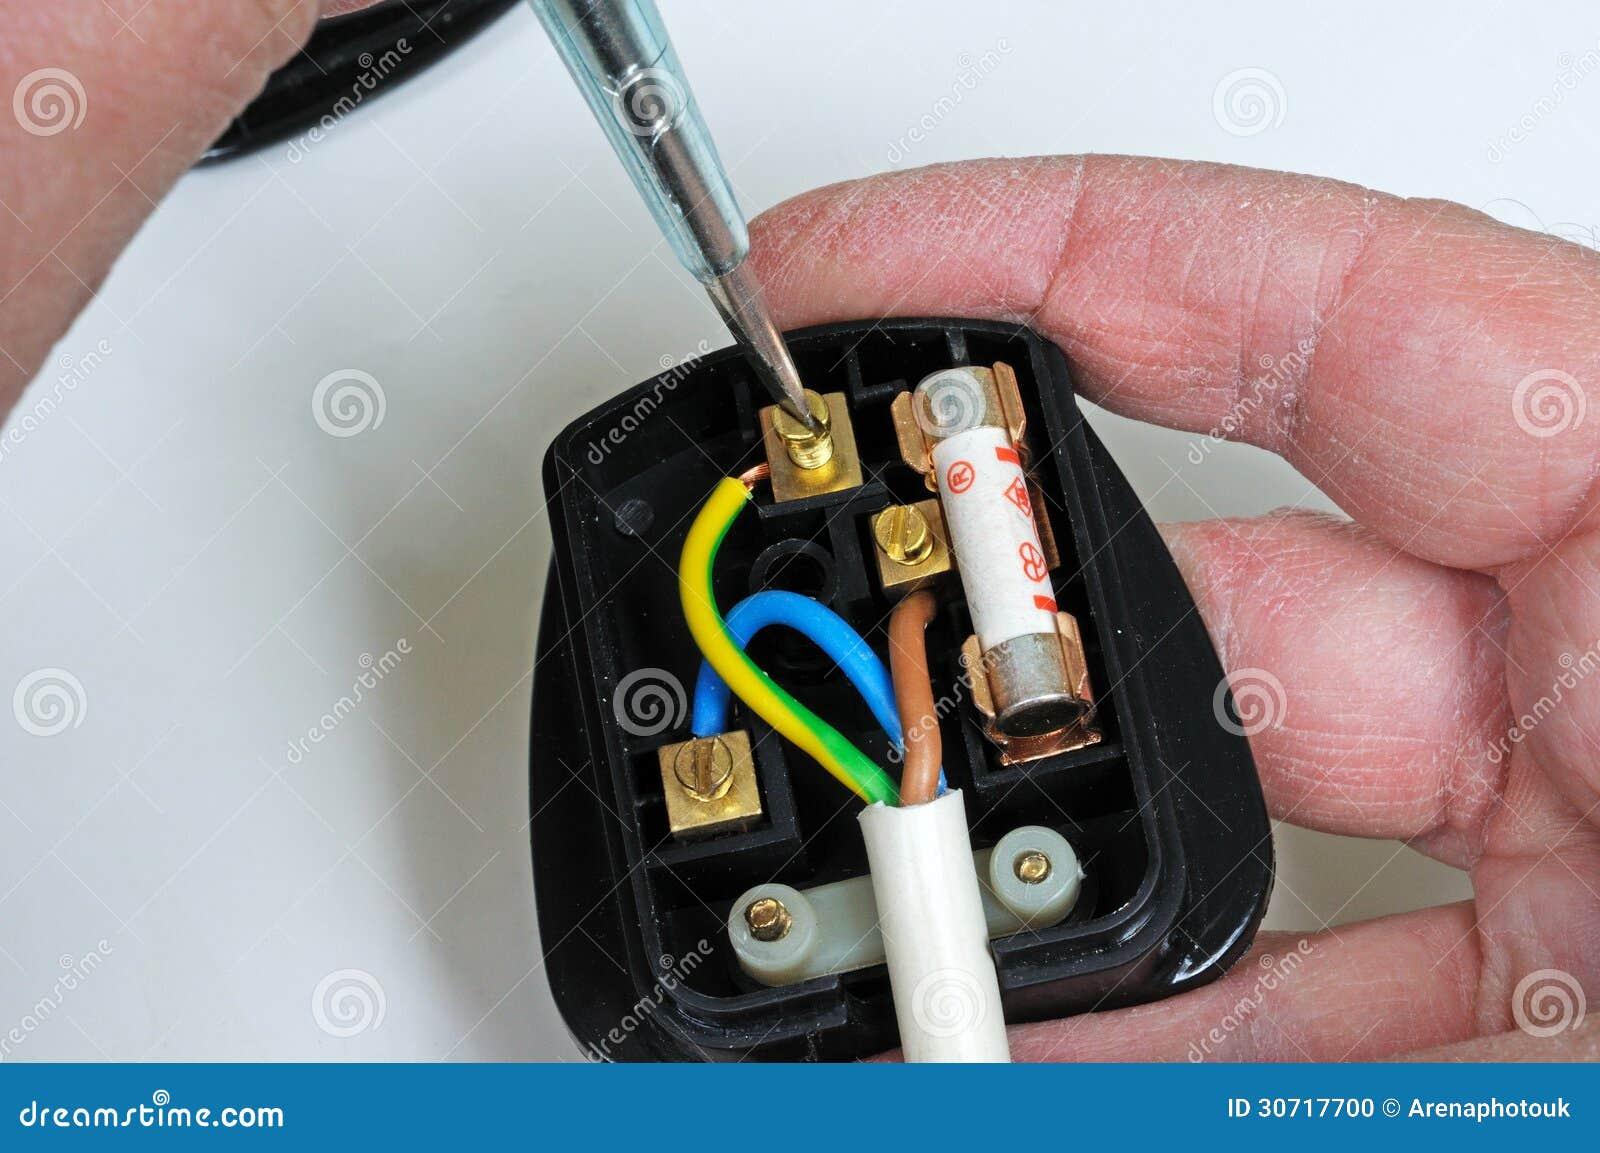 Wiring an English plug.